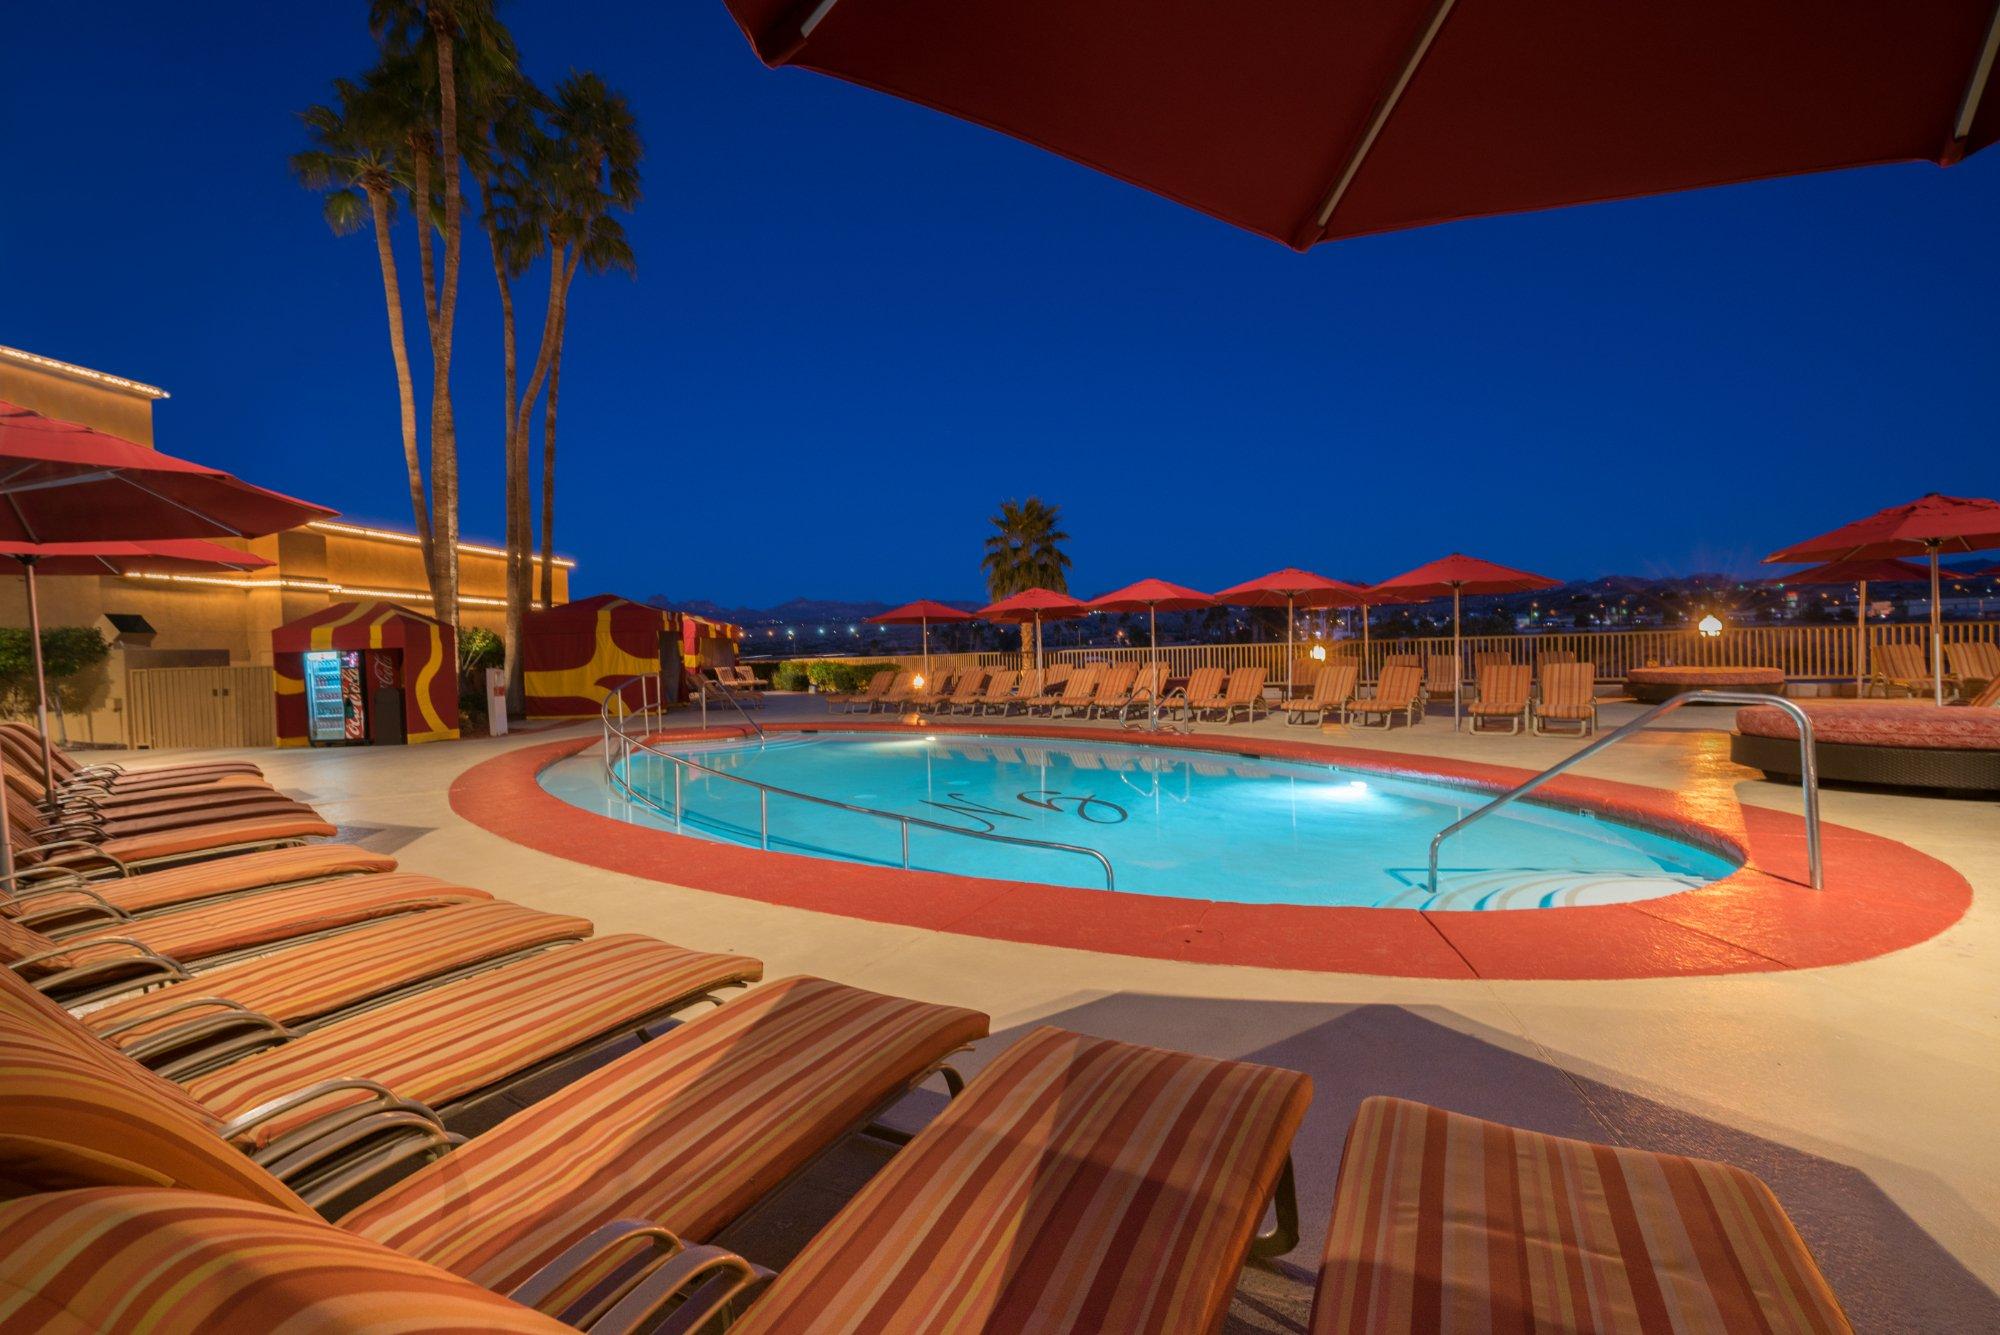 Golden nugget hotel & casino laughlin